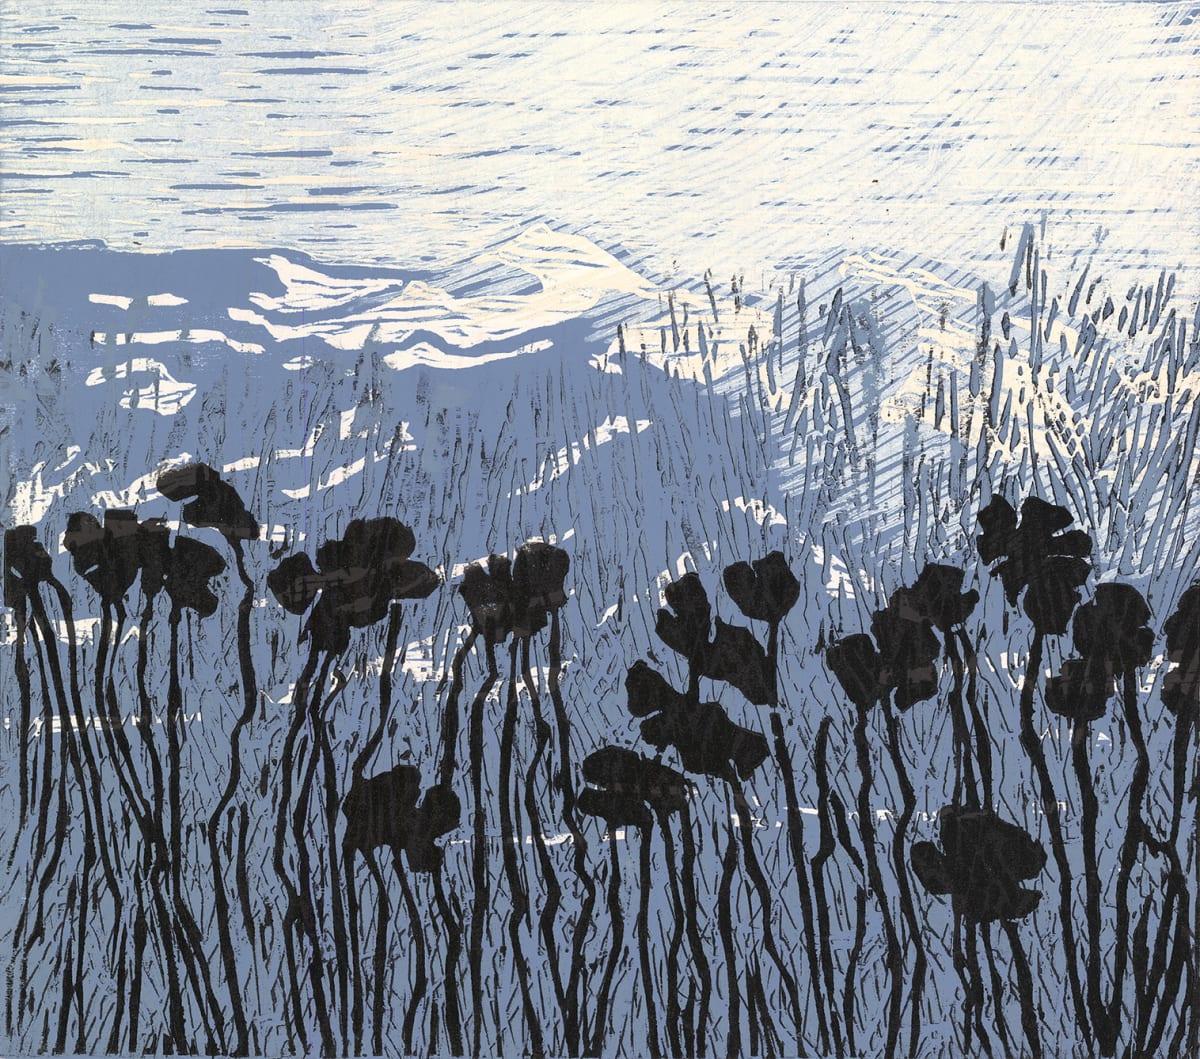 Patrick Huse Dark Flowers in Misty Mountains, 2019 Woodcut 47 x 53